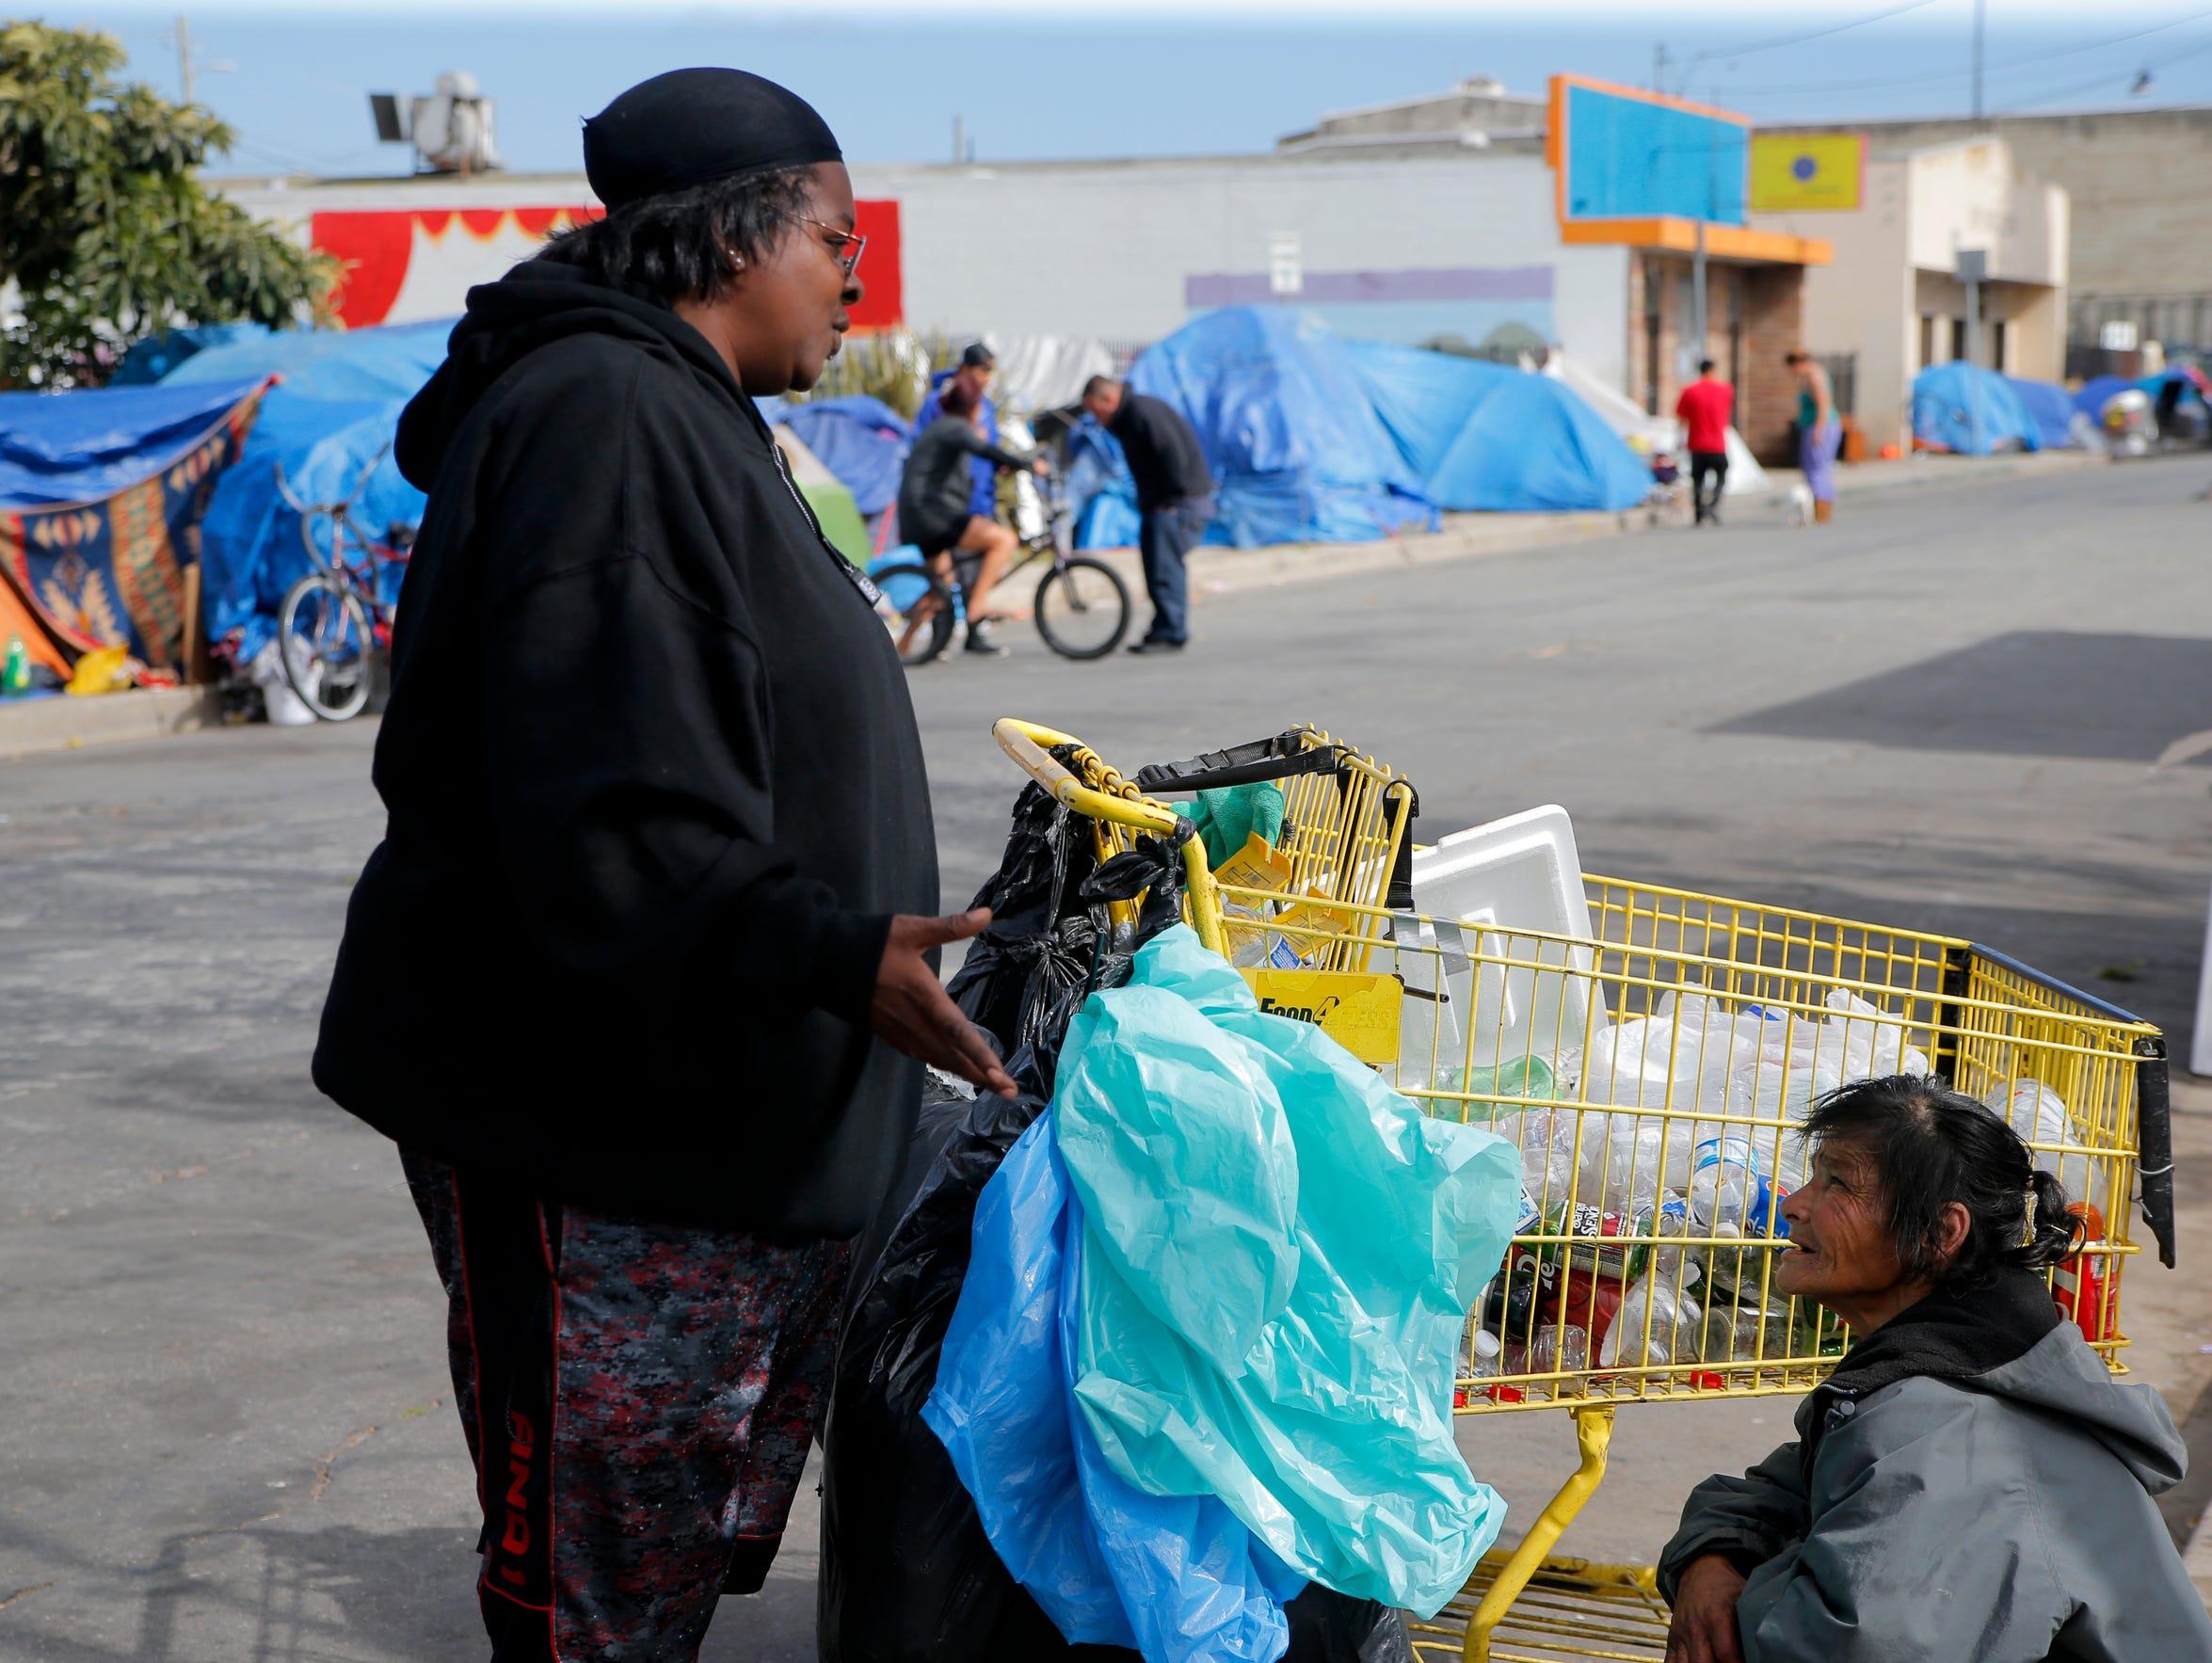 Yolanda Harraway speaks with Chinatown residents during